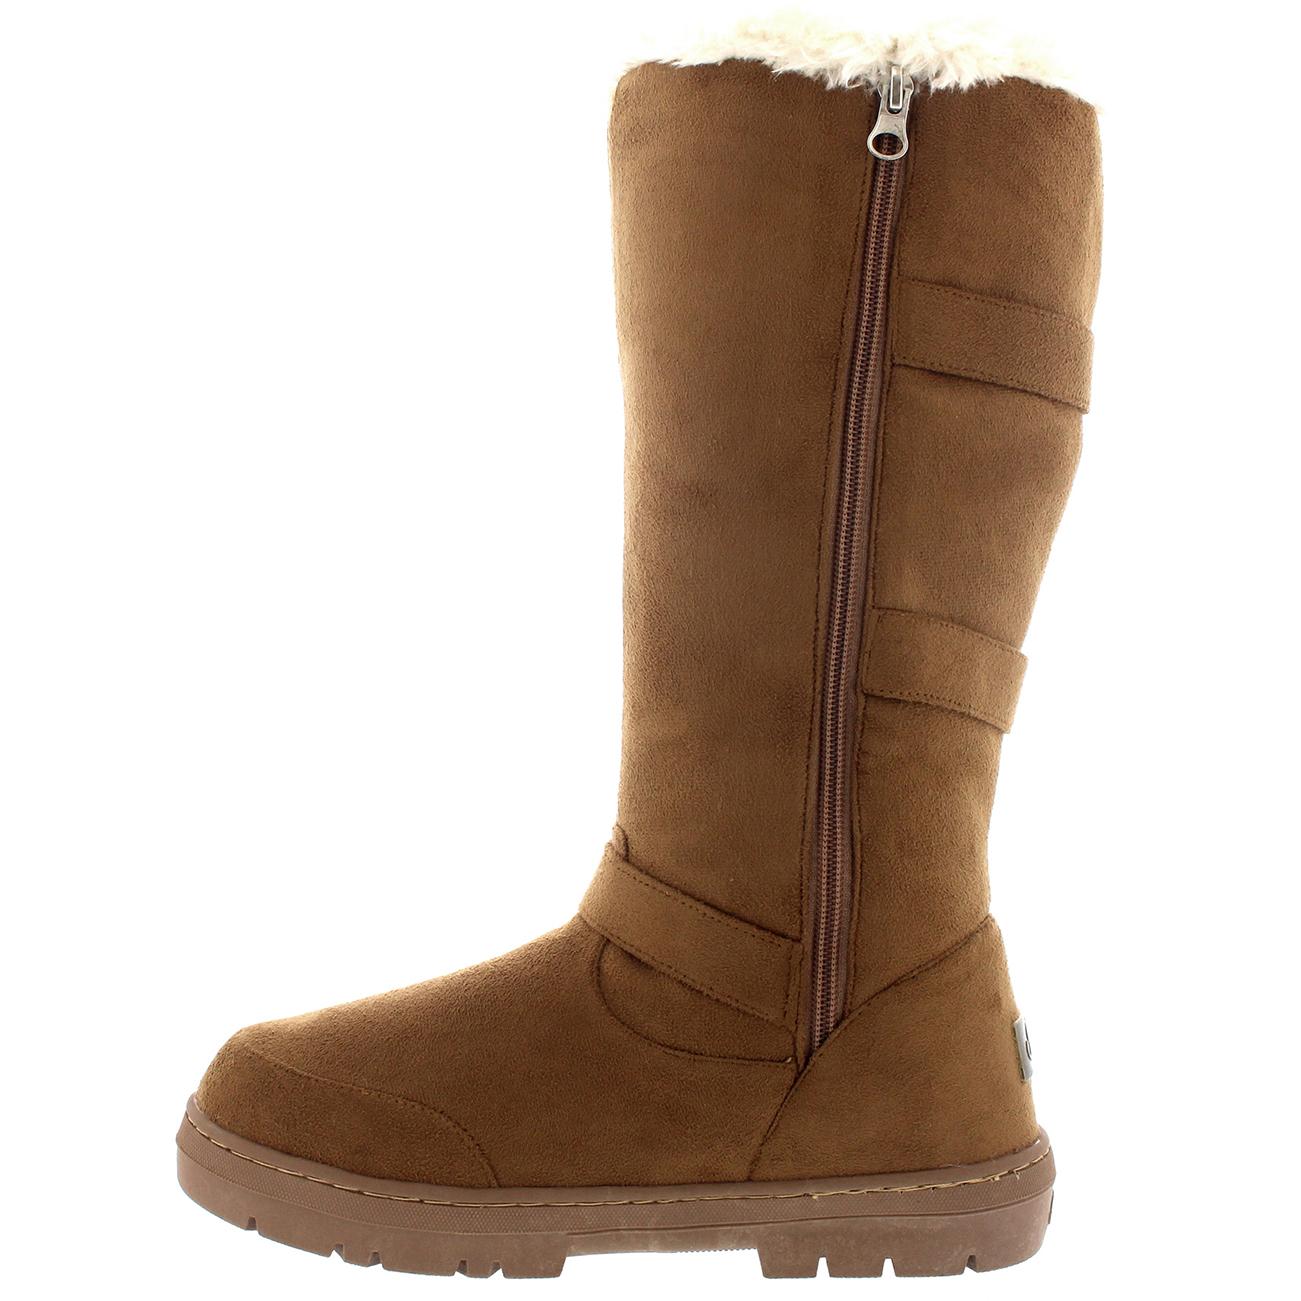 Womens Knee High Fur Lined Snow Waterproof Hard Sole Slouch Long ... a95559ac8